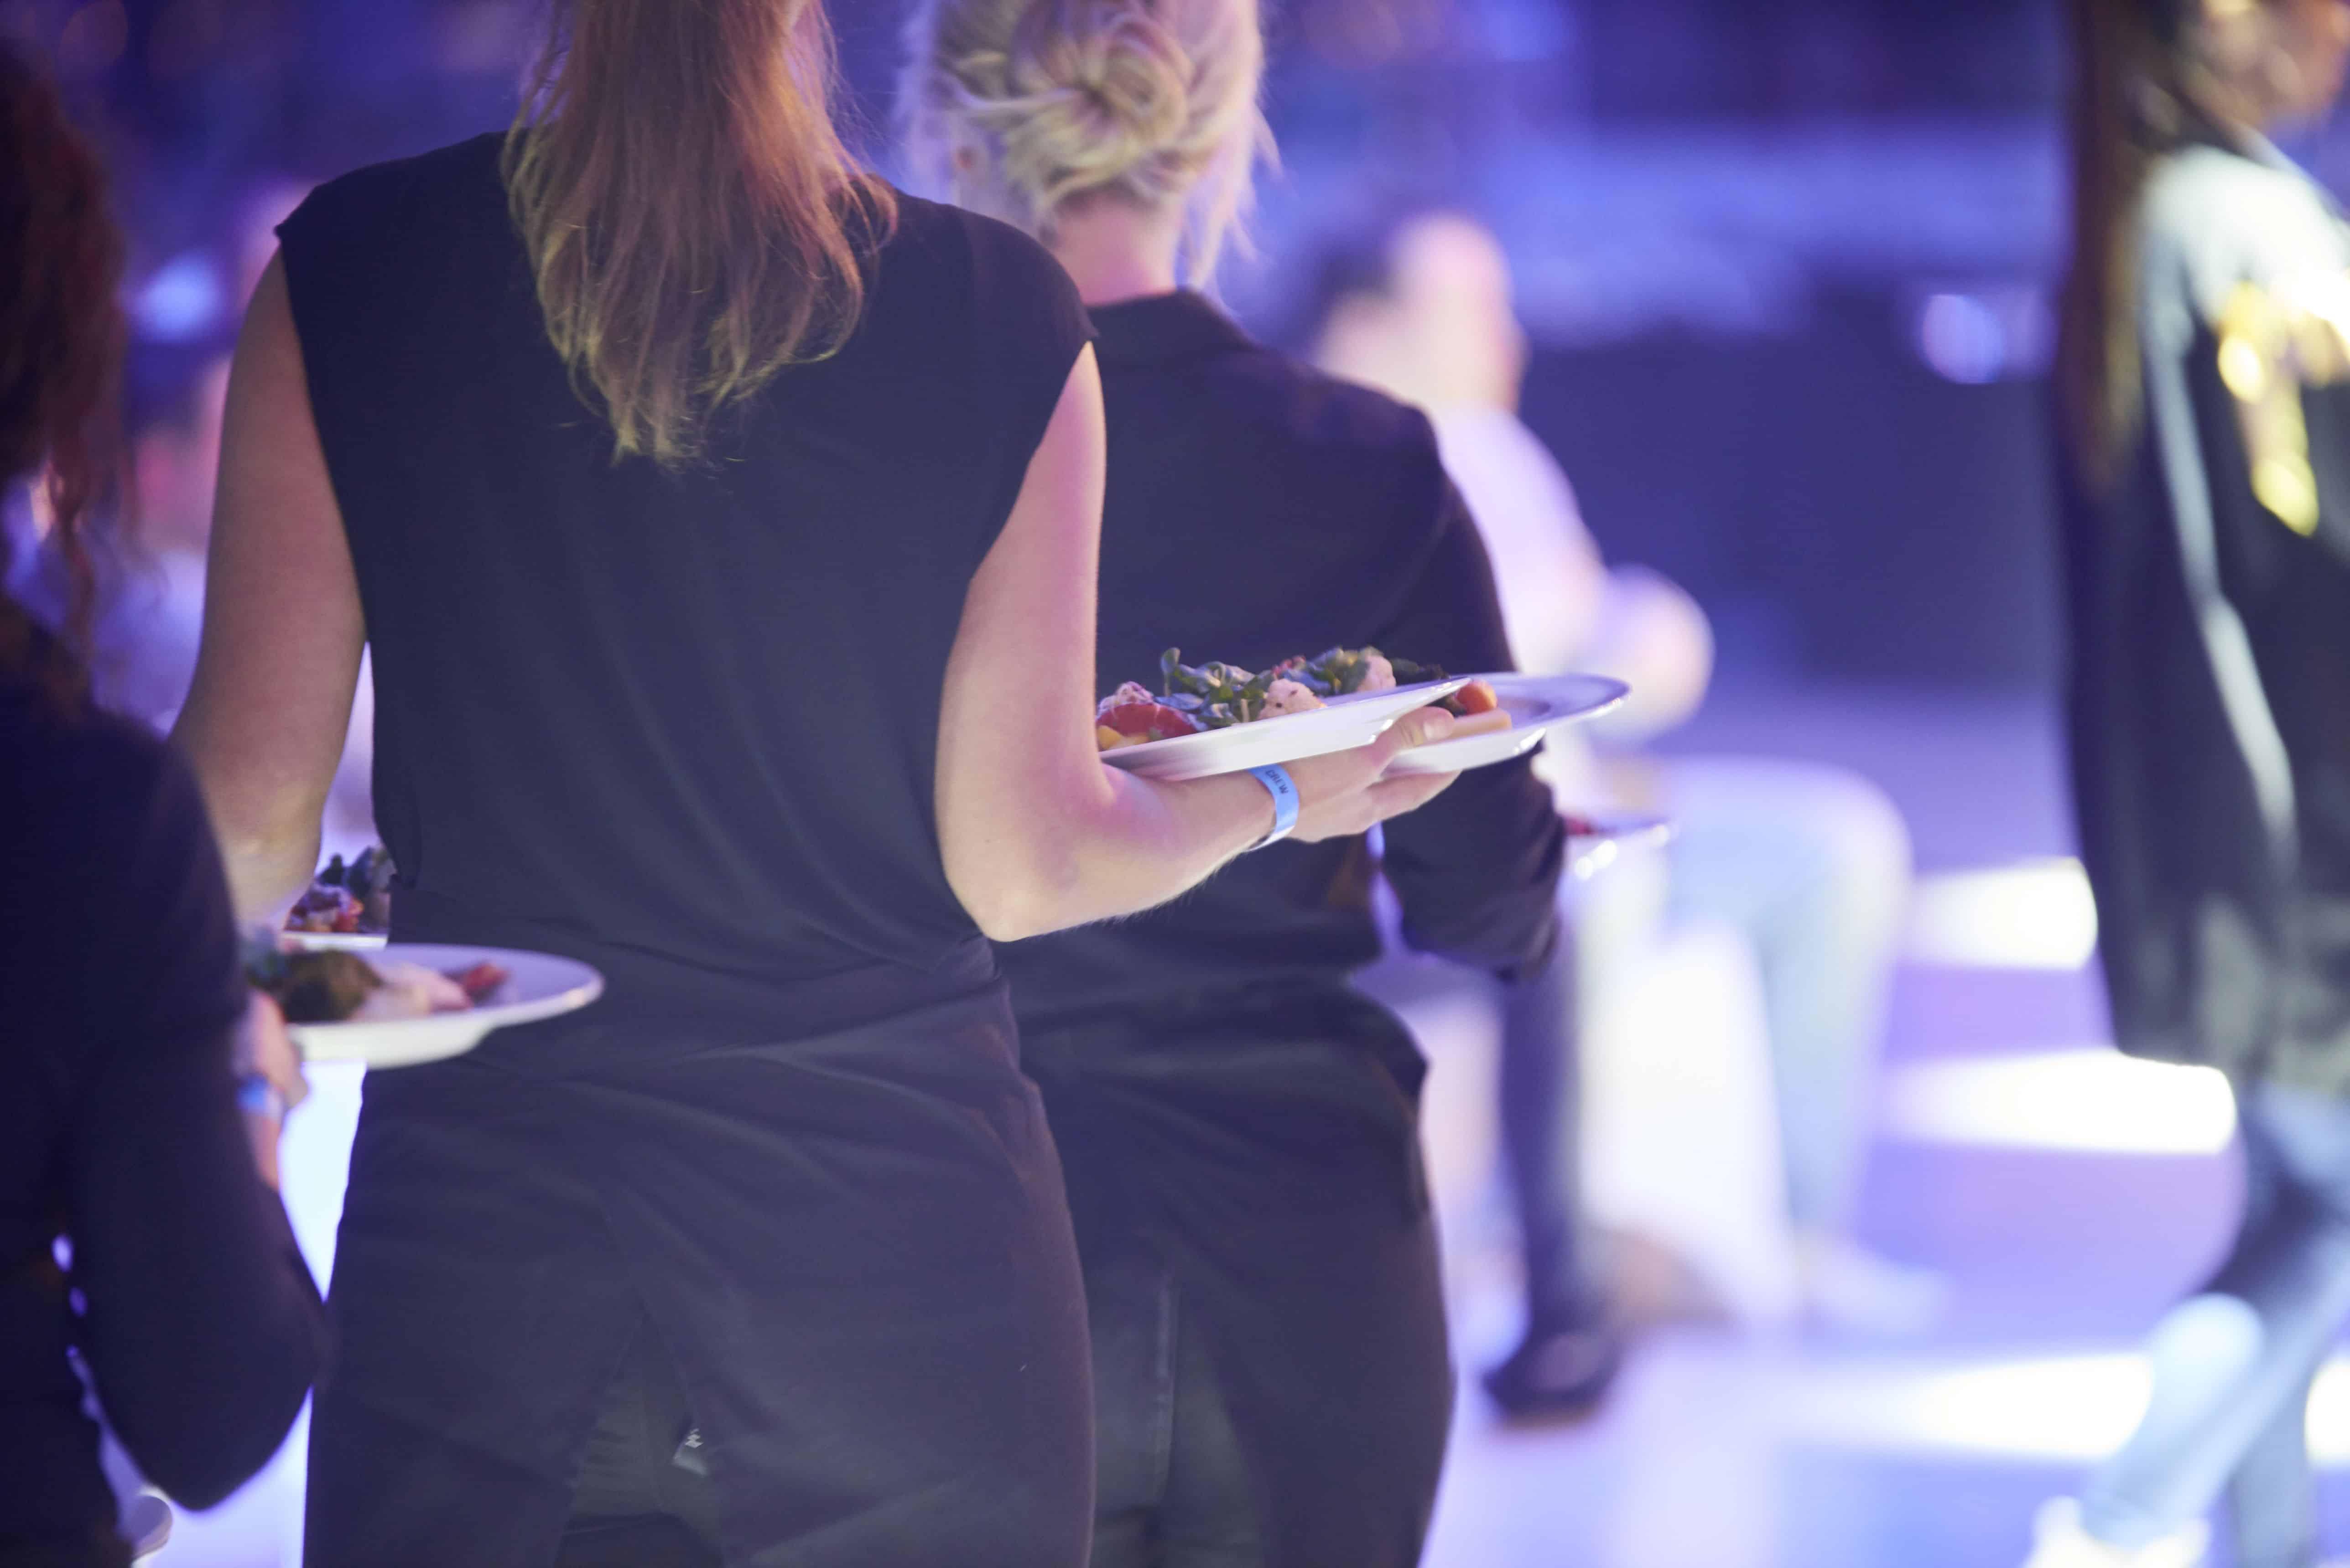 Bosseln und Kallen Catering Essen Foodtruck (2)